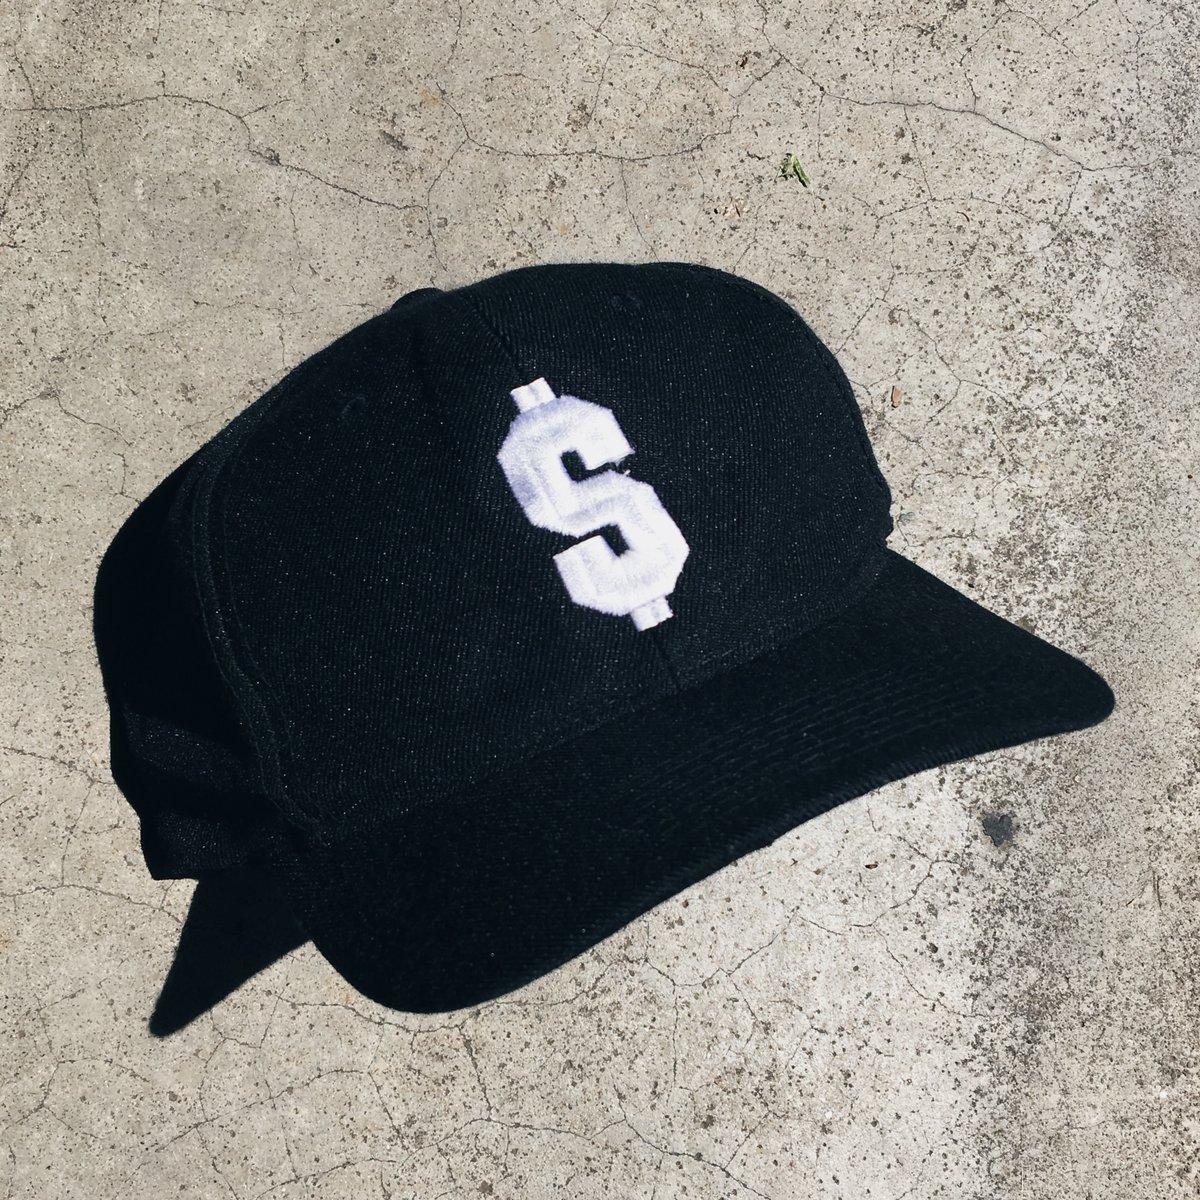 Image of Original 90's Ice-T Snapback Hat.